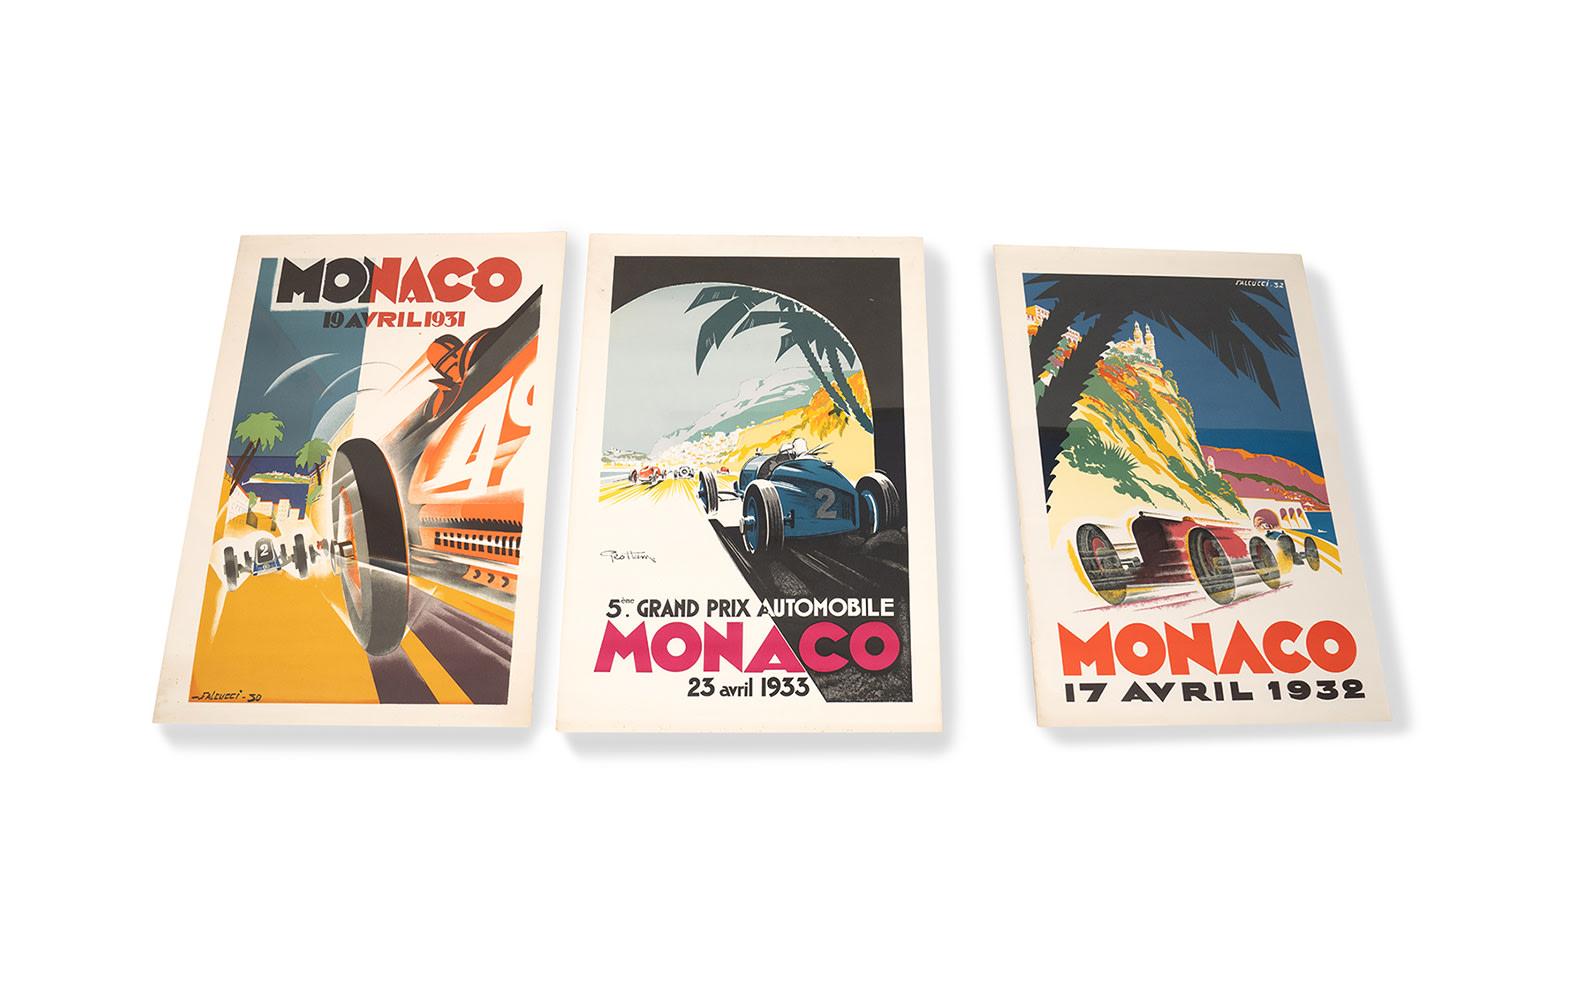 Collection of Monaco Grand Prix Posters